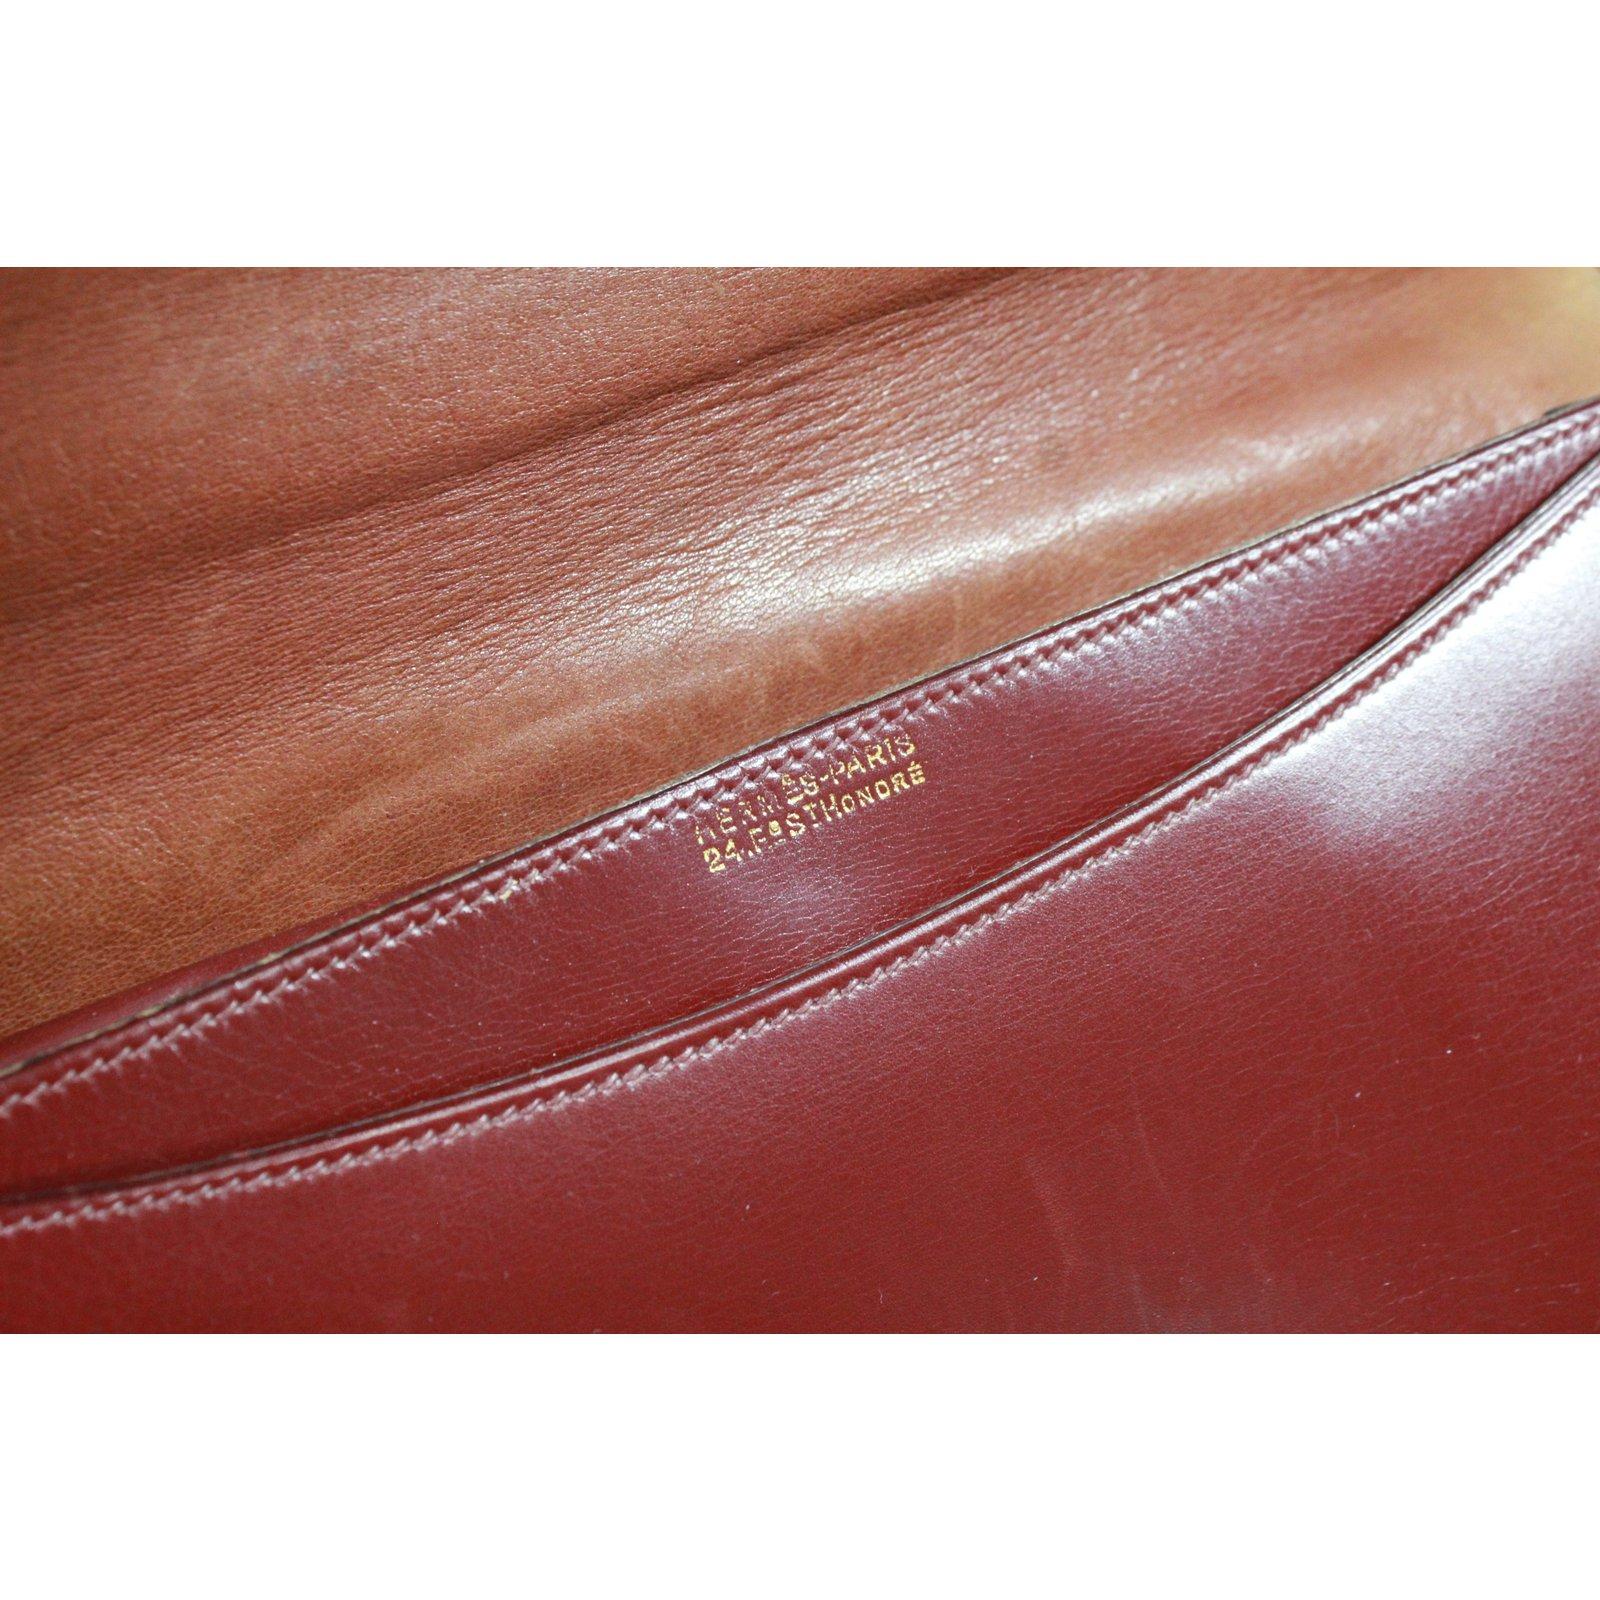 ab7c9e0dcbd4 Hermès Handbags Handbags Leather Dark red ref.88952 - Joli Closet